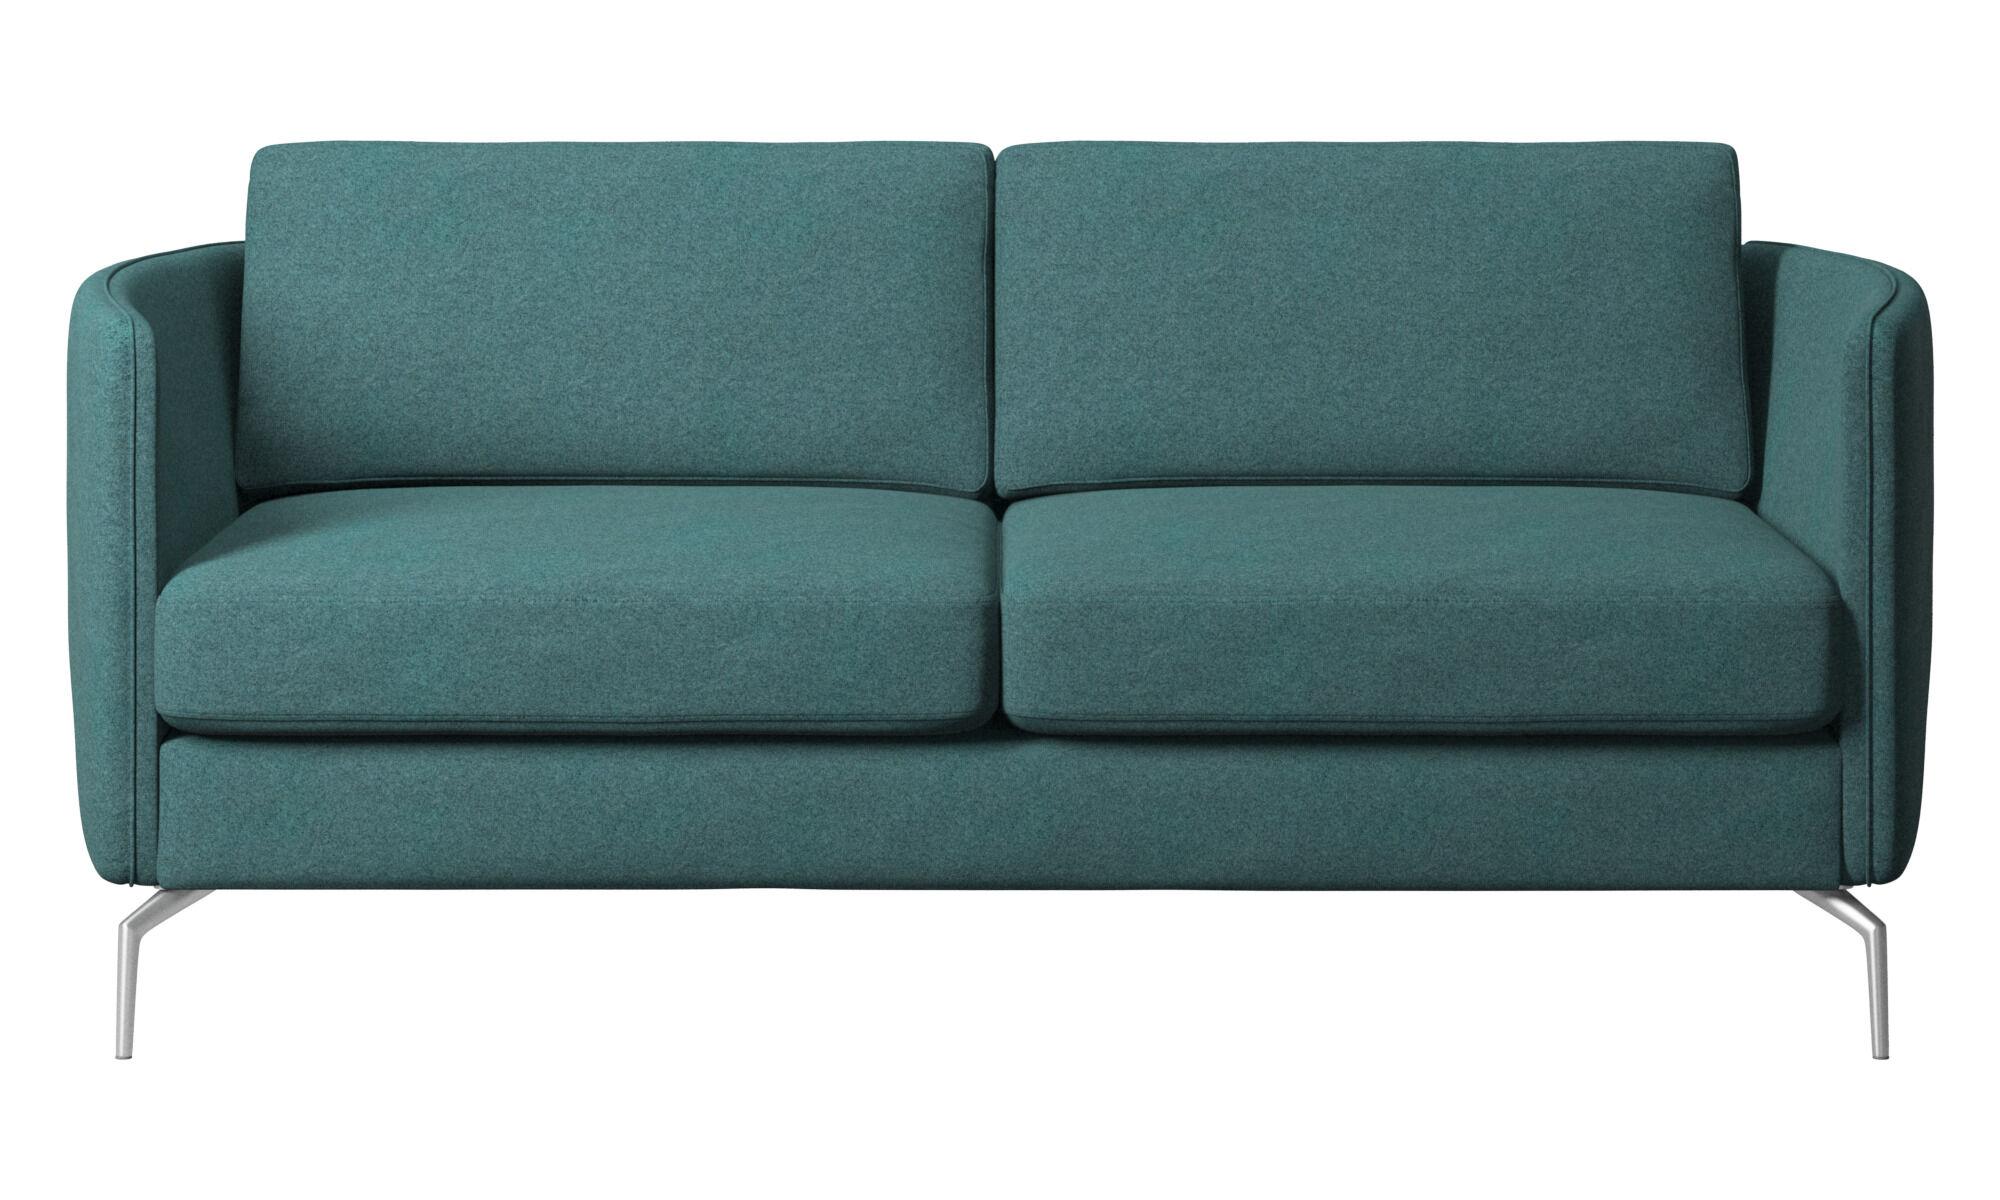 Genial 2 Seater Sofas   Osaka Sofa, Regular Seat   Green   Fabric ...